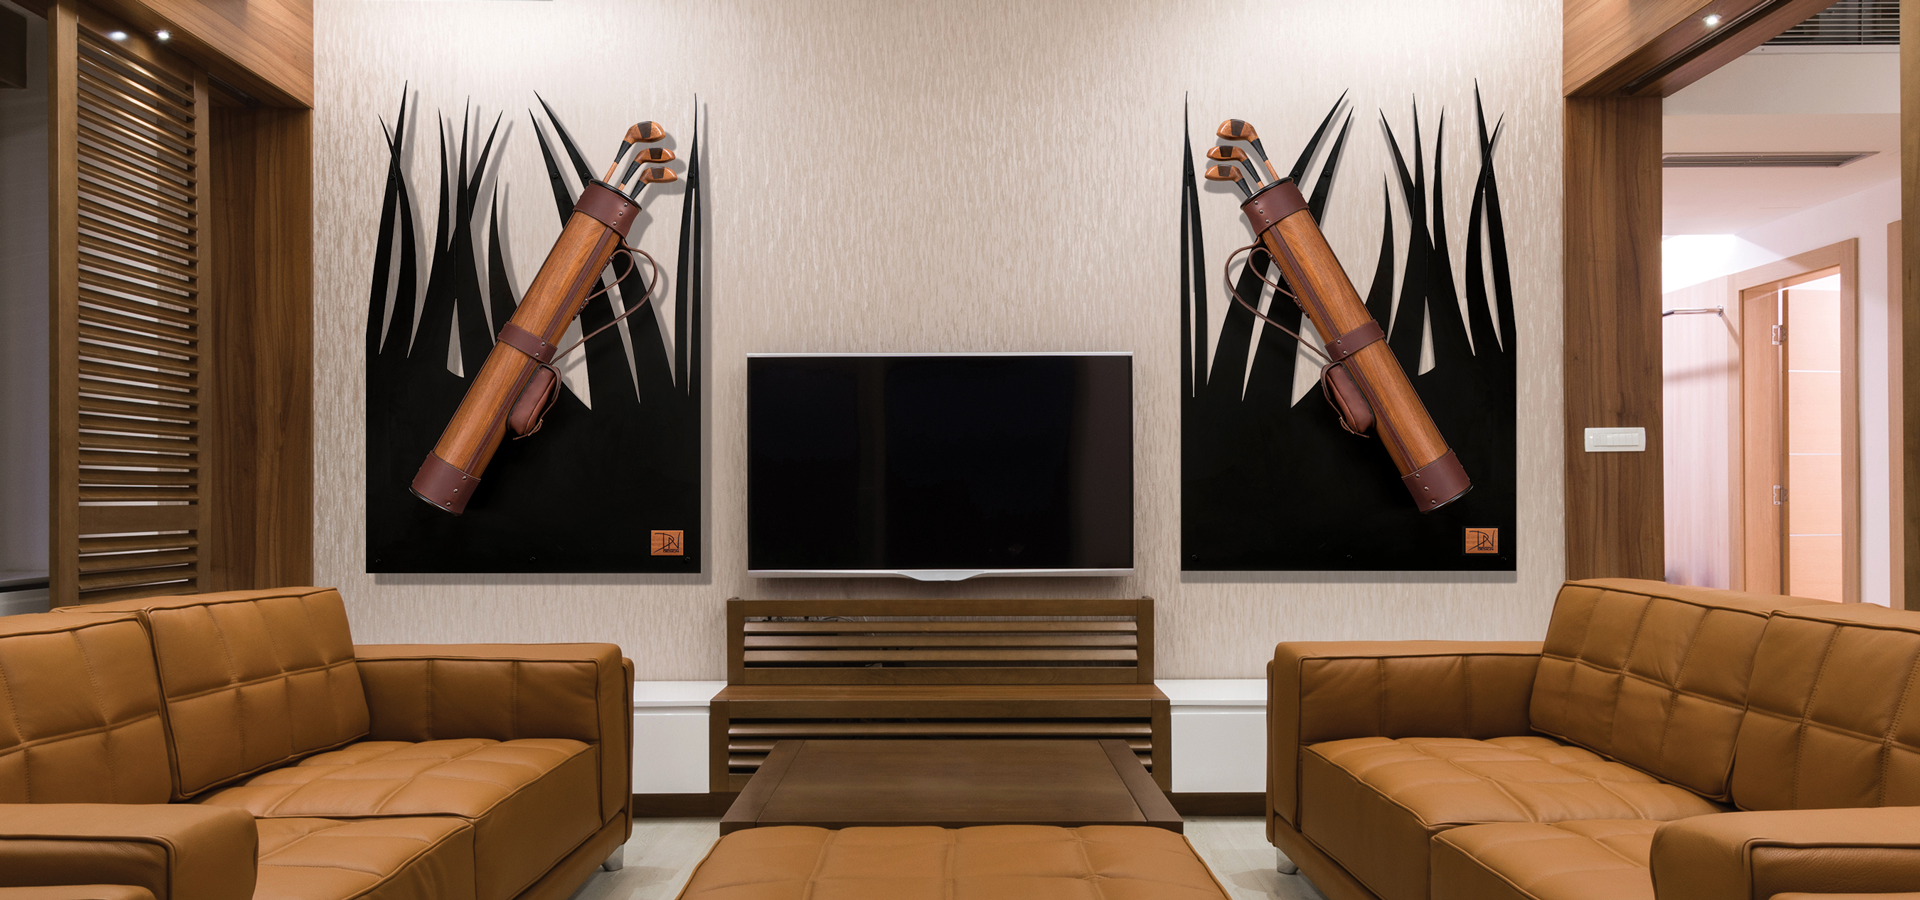 David Norman Design | Furniture U0026 Lifestyle